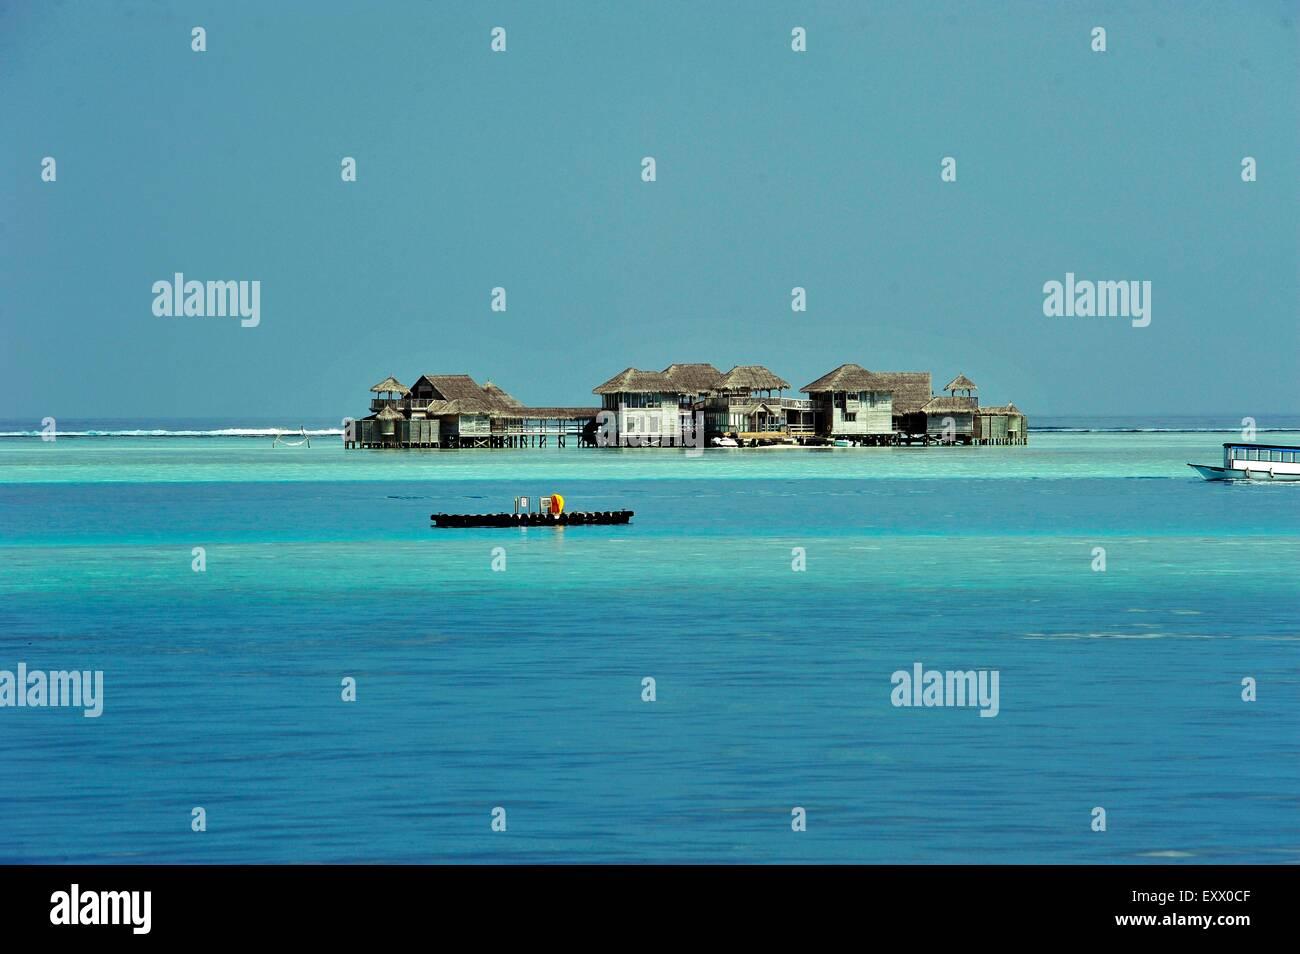 Stilt huts in indian ocean, The Maledives - Stock Image